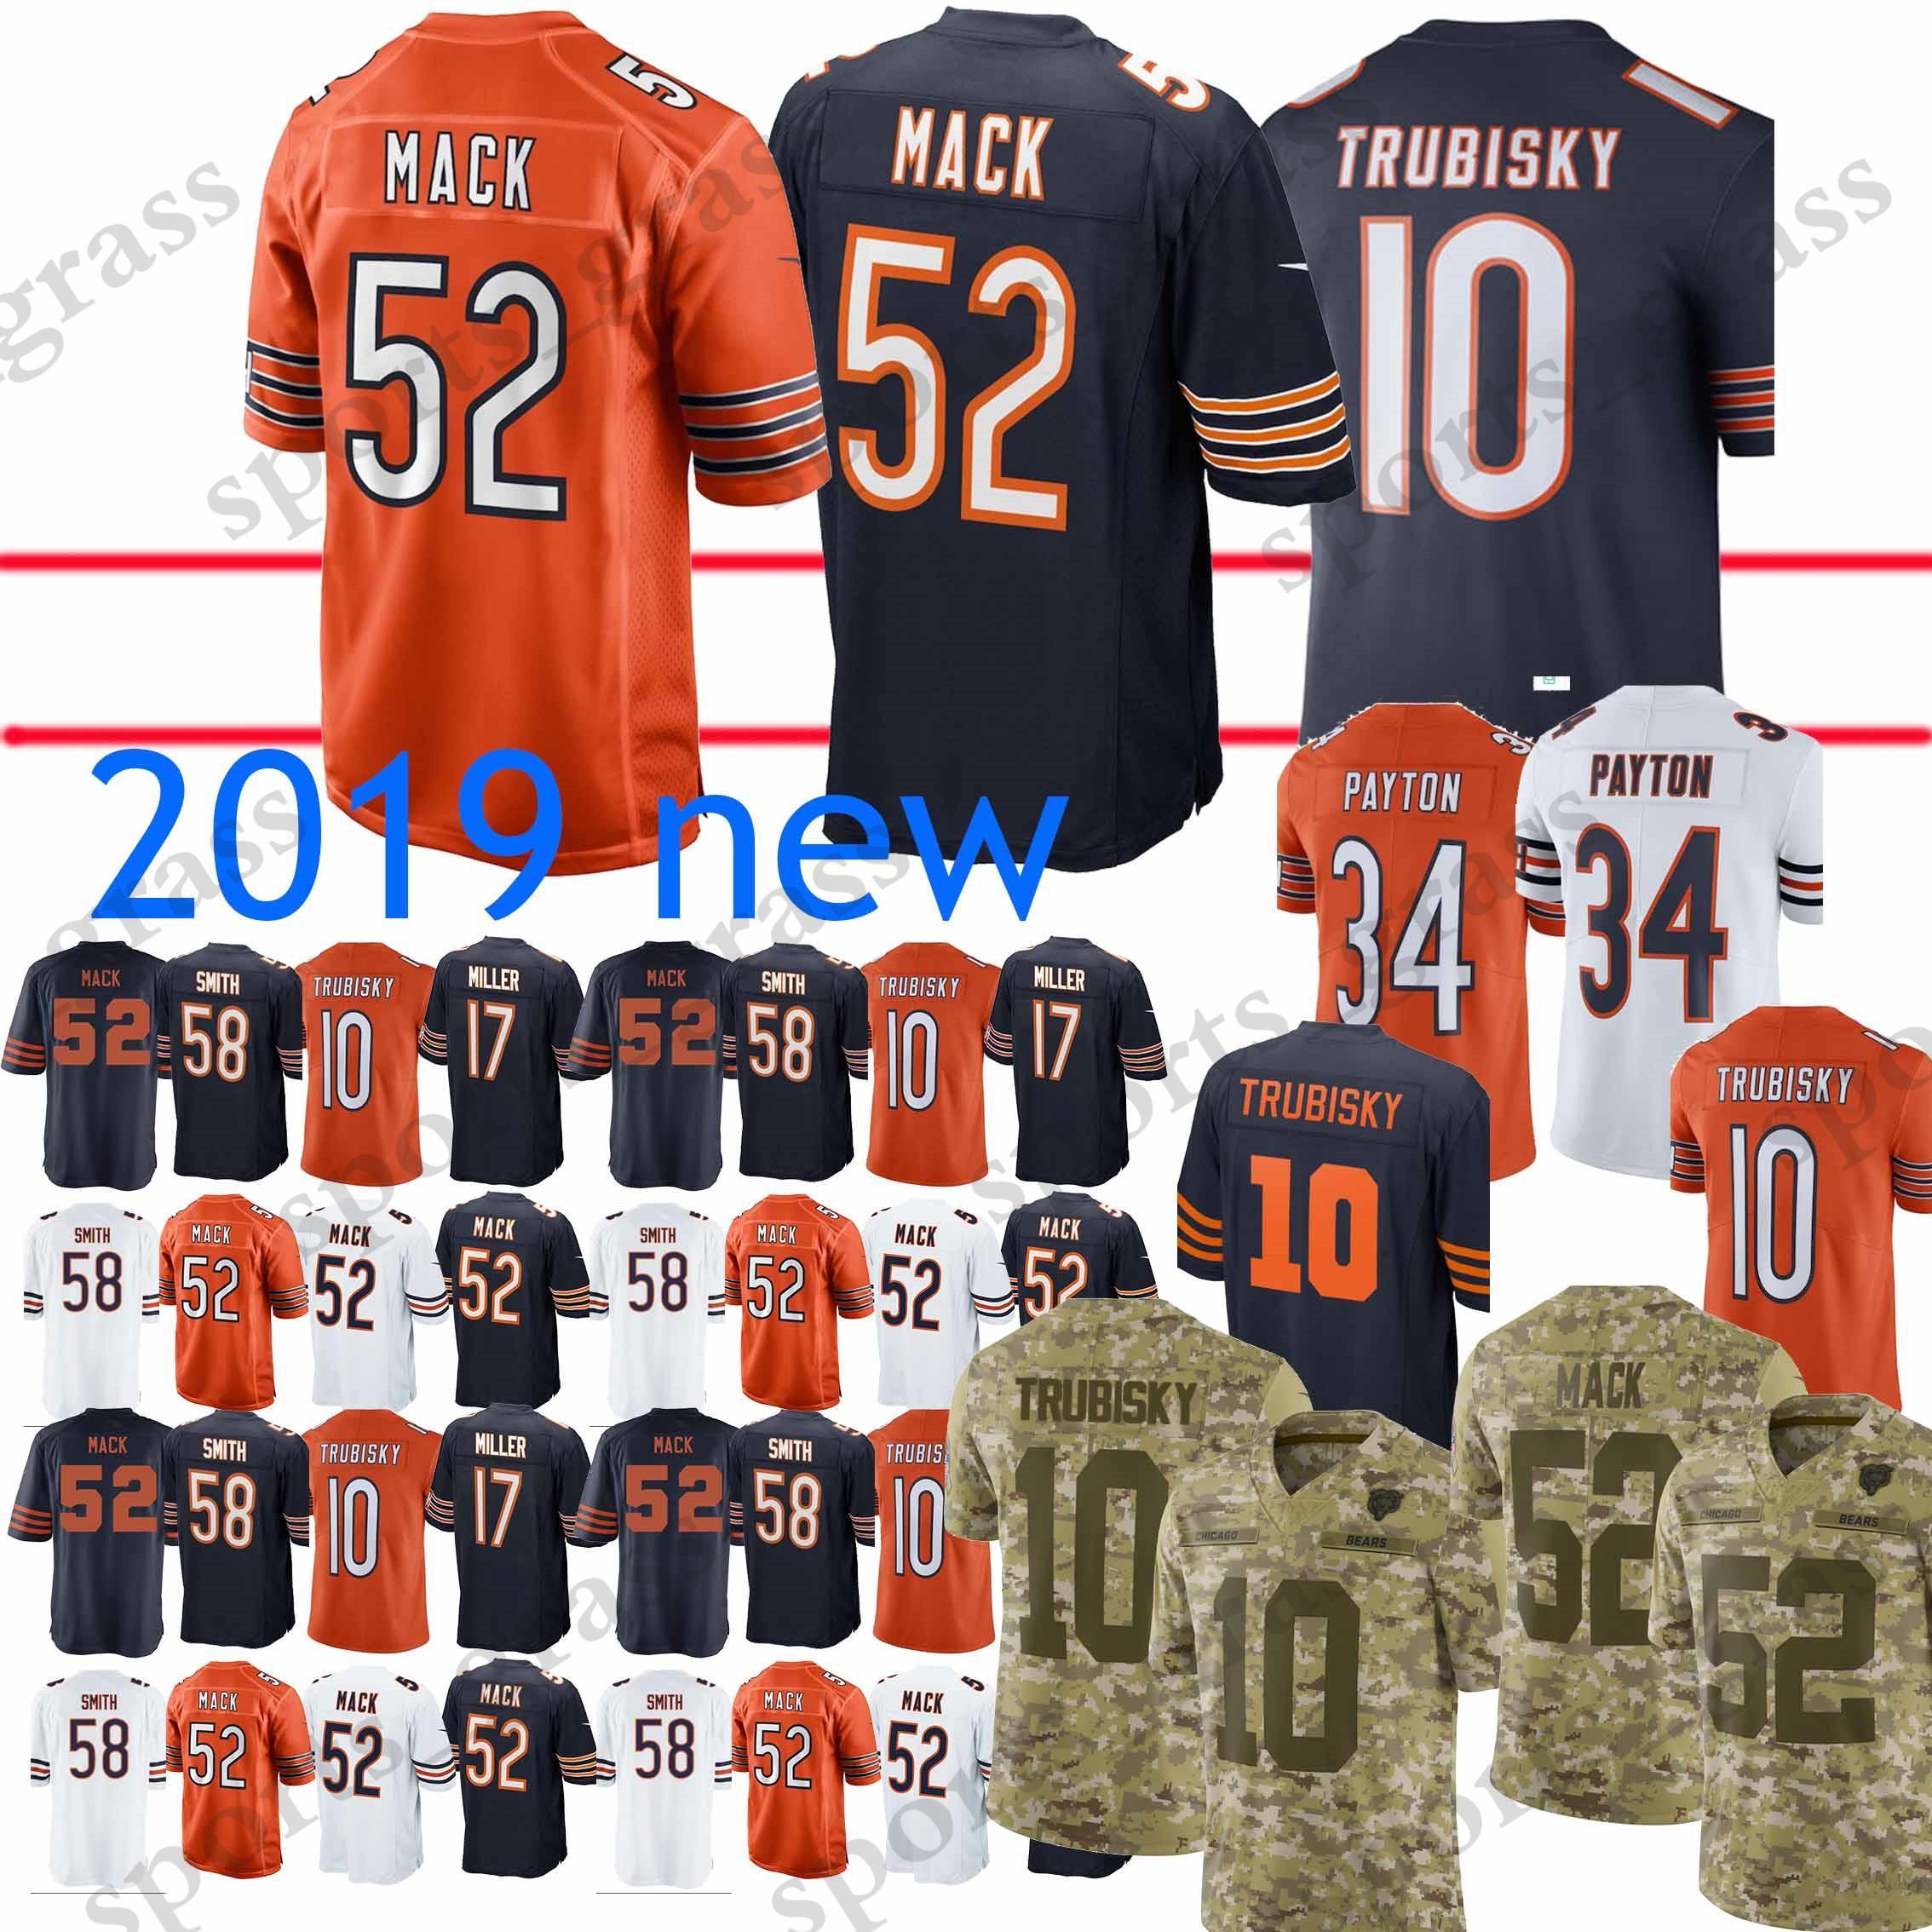 online store 2577a af21c discount code for khalil mack jersey xl 72d81 efde1